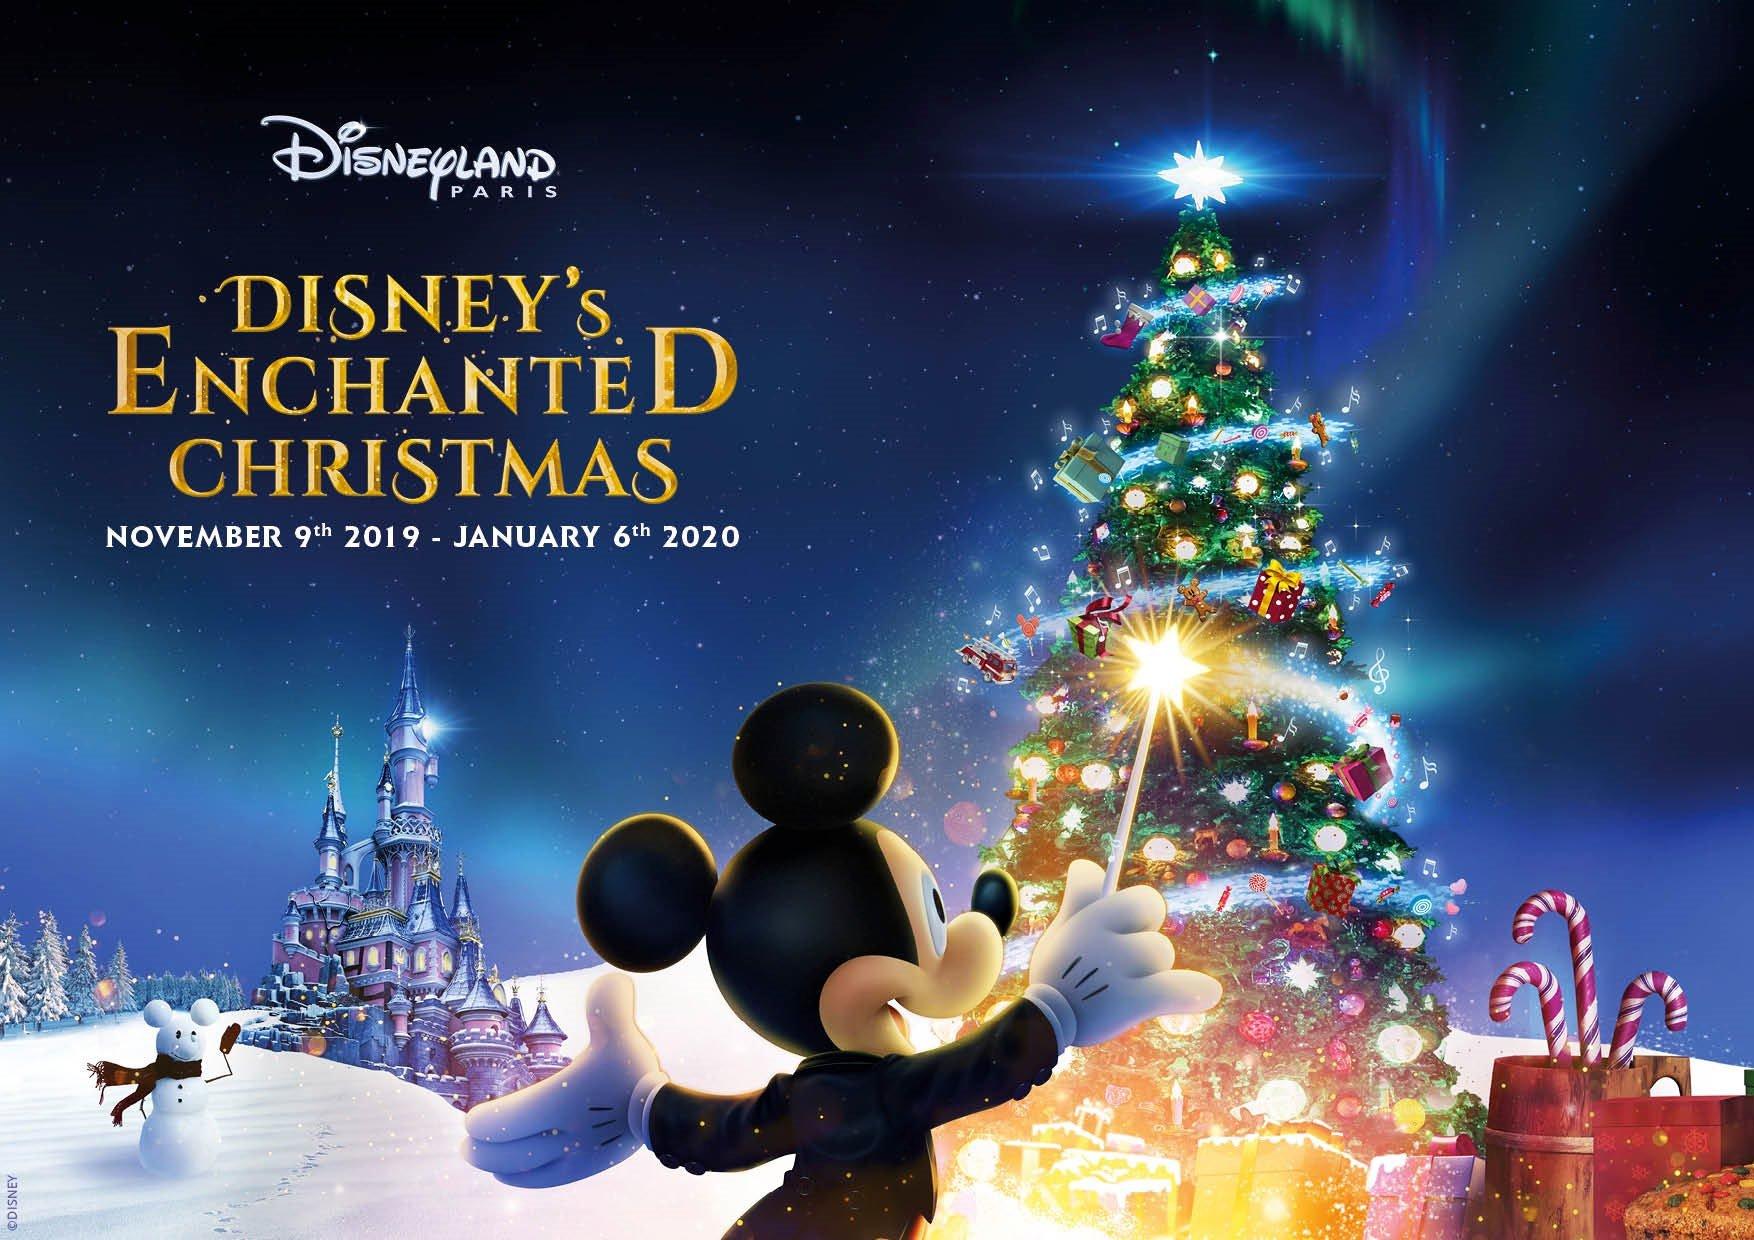 Disney's Enchanted Christmas 2019